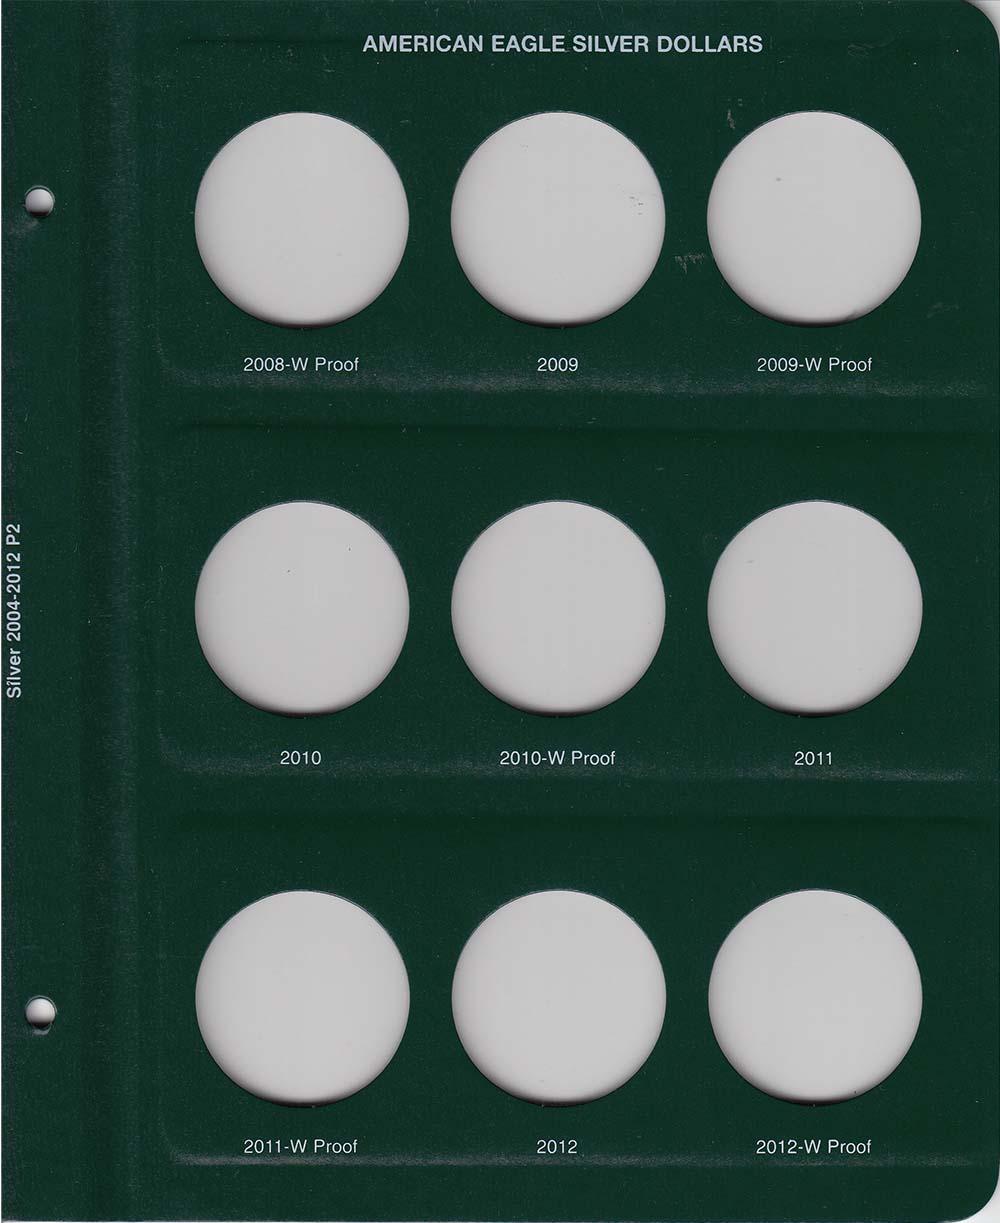 Intercept Shield Coin Album For 50 State Quarters 2004-2008 New Free Slipcase